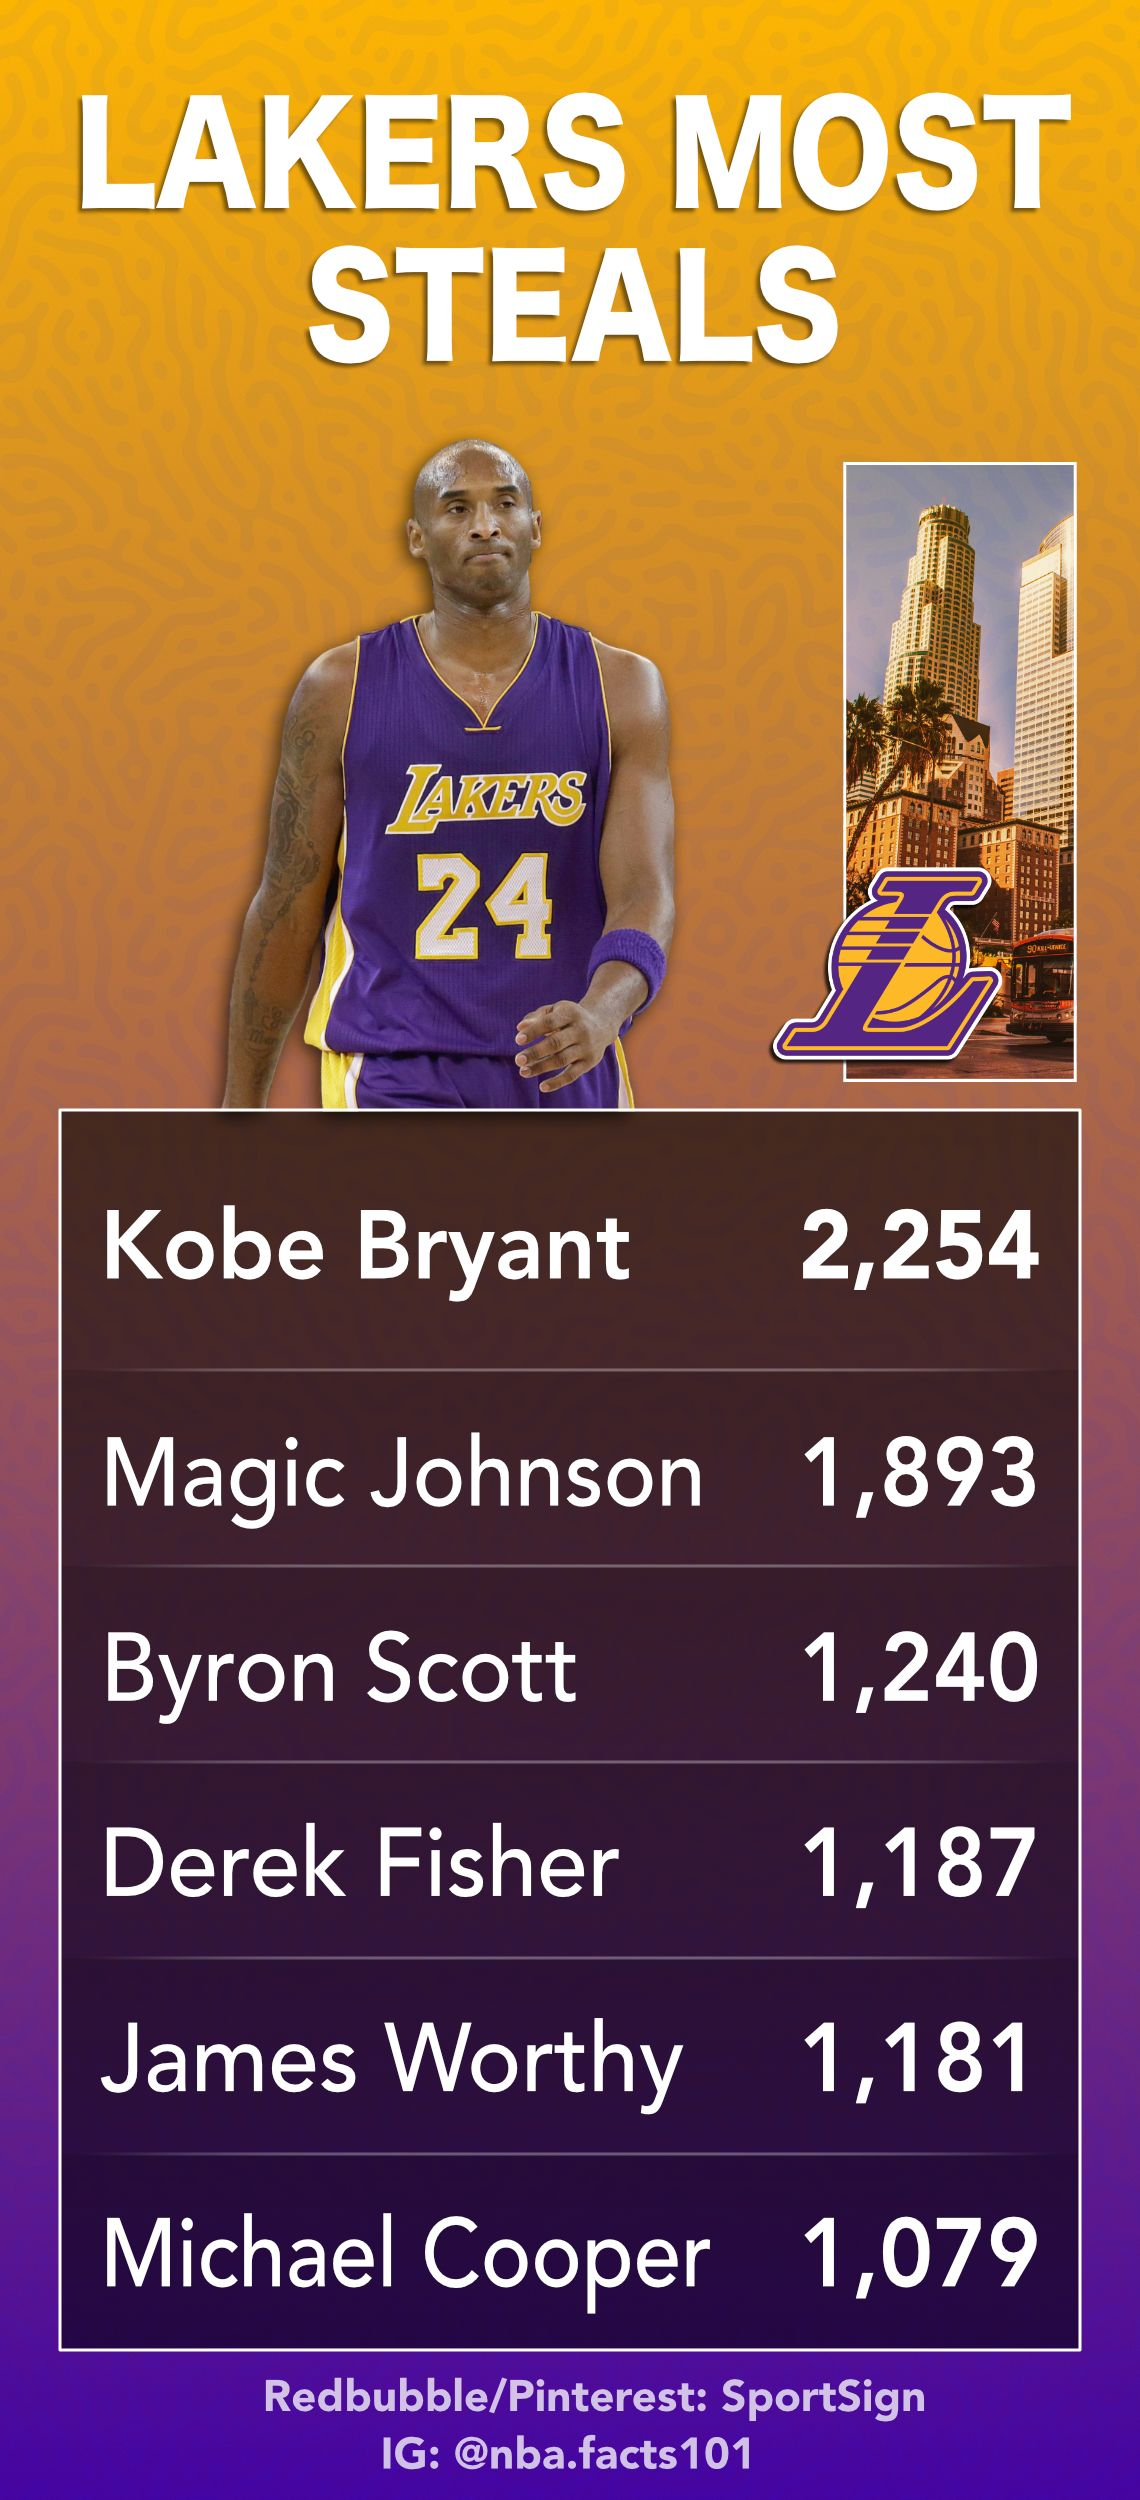 Nba Basketball Team Los Angeles Lakers Steal Leaders 1 Kobe Bryant 2 Magic Johnson 3 Byron Scott 4 Derek Fish Nba Basketball Teams Lakers Lakers Basketball